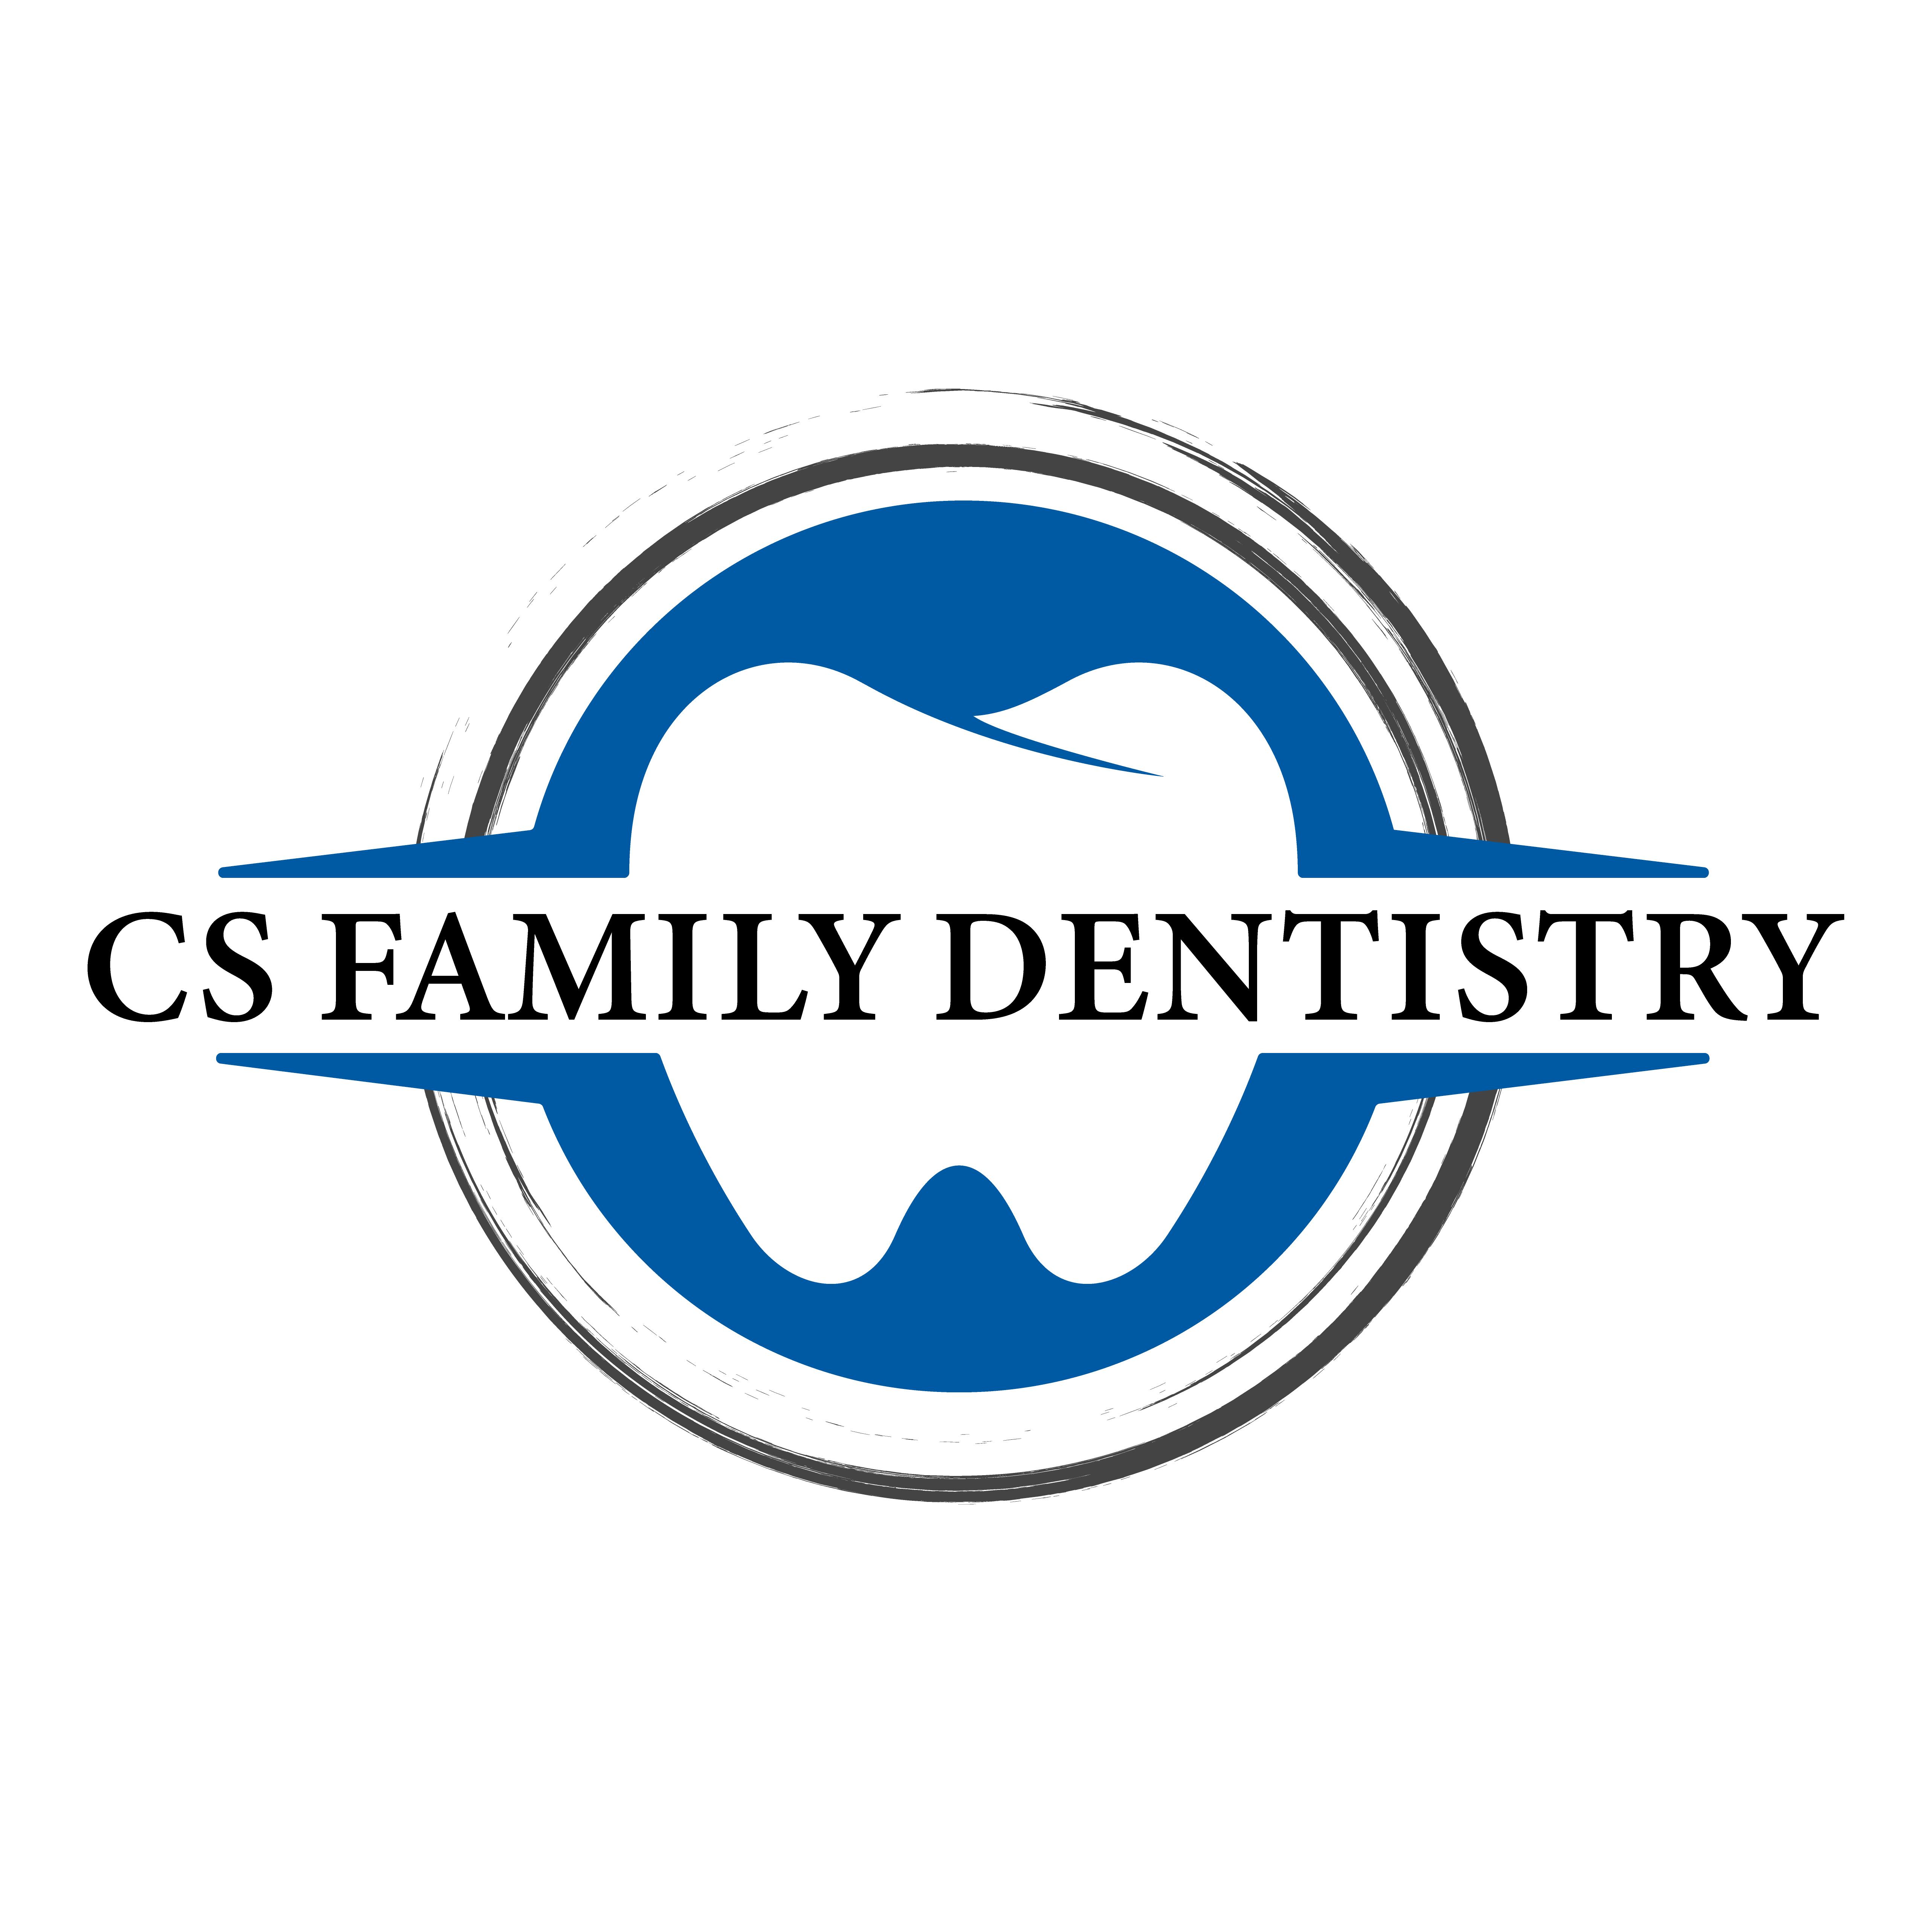 CS Family Dentistry: Cole Smith, DDS Logo